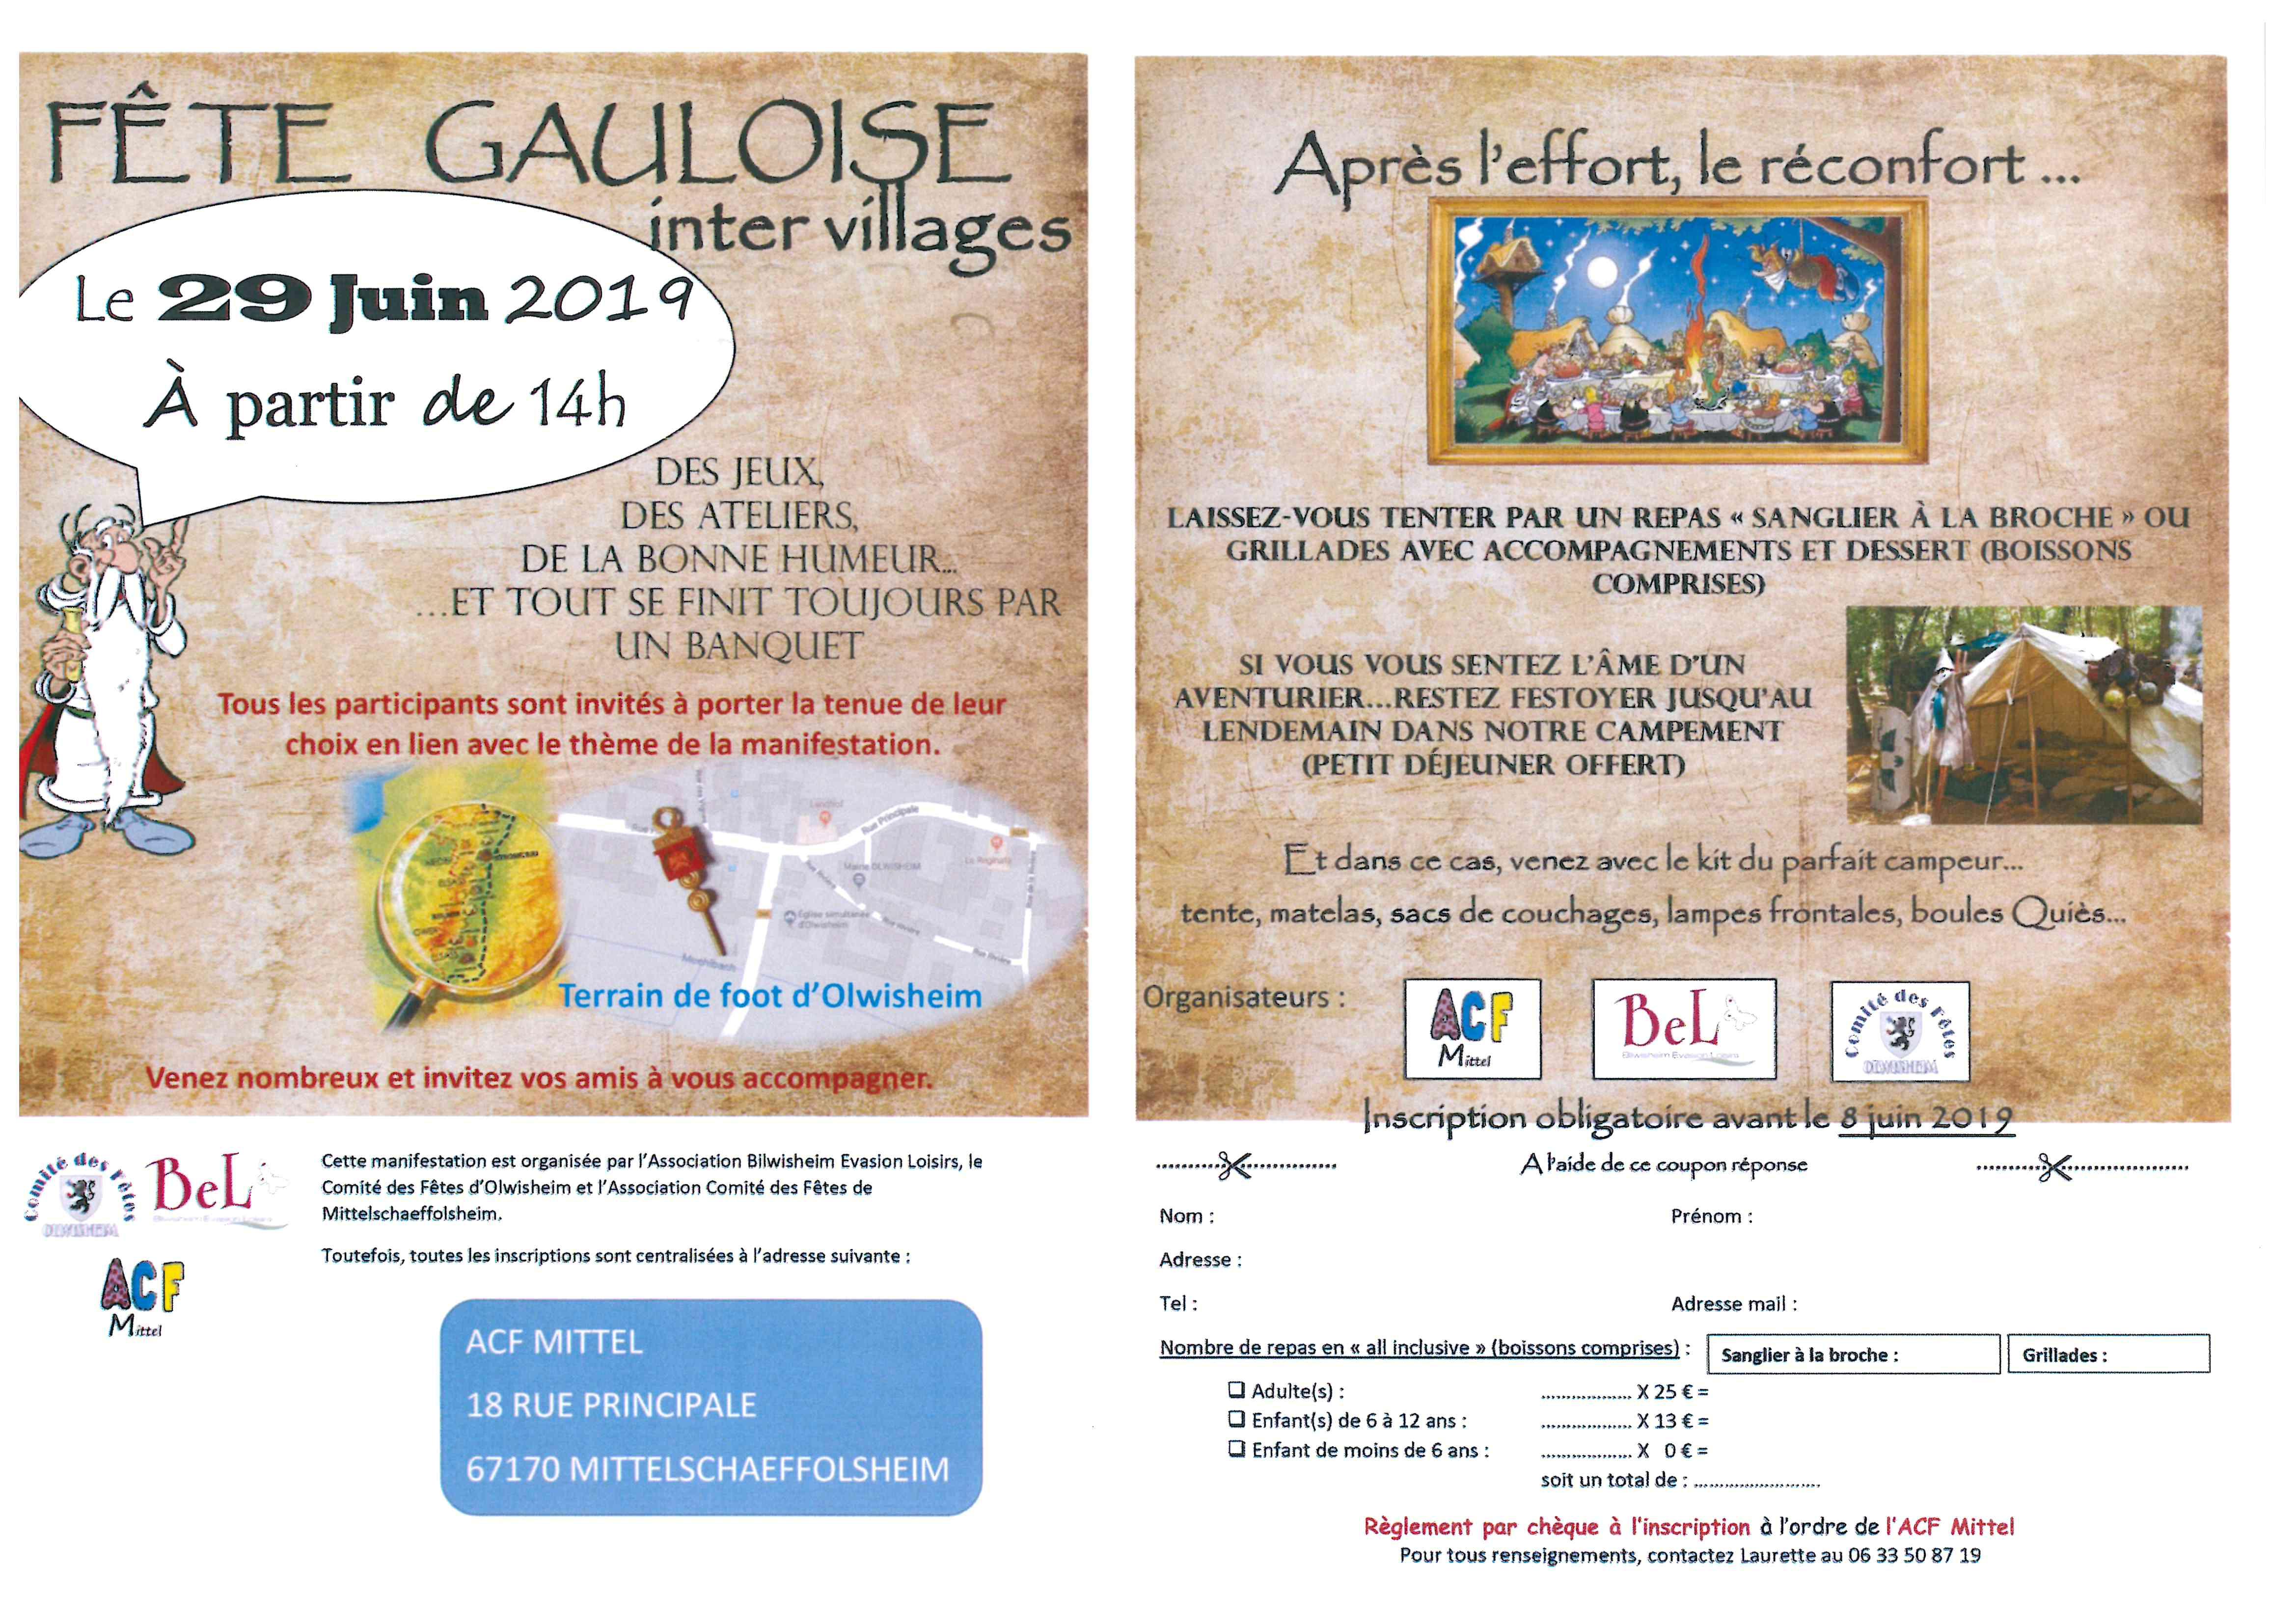 Fête Gauloise inter villages